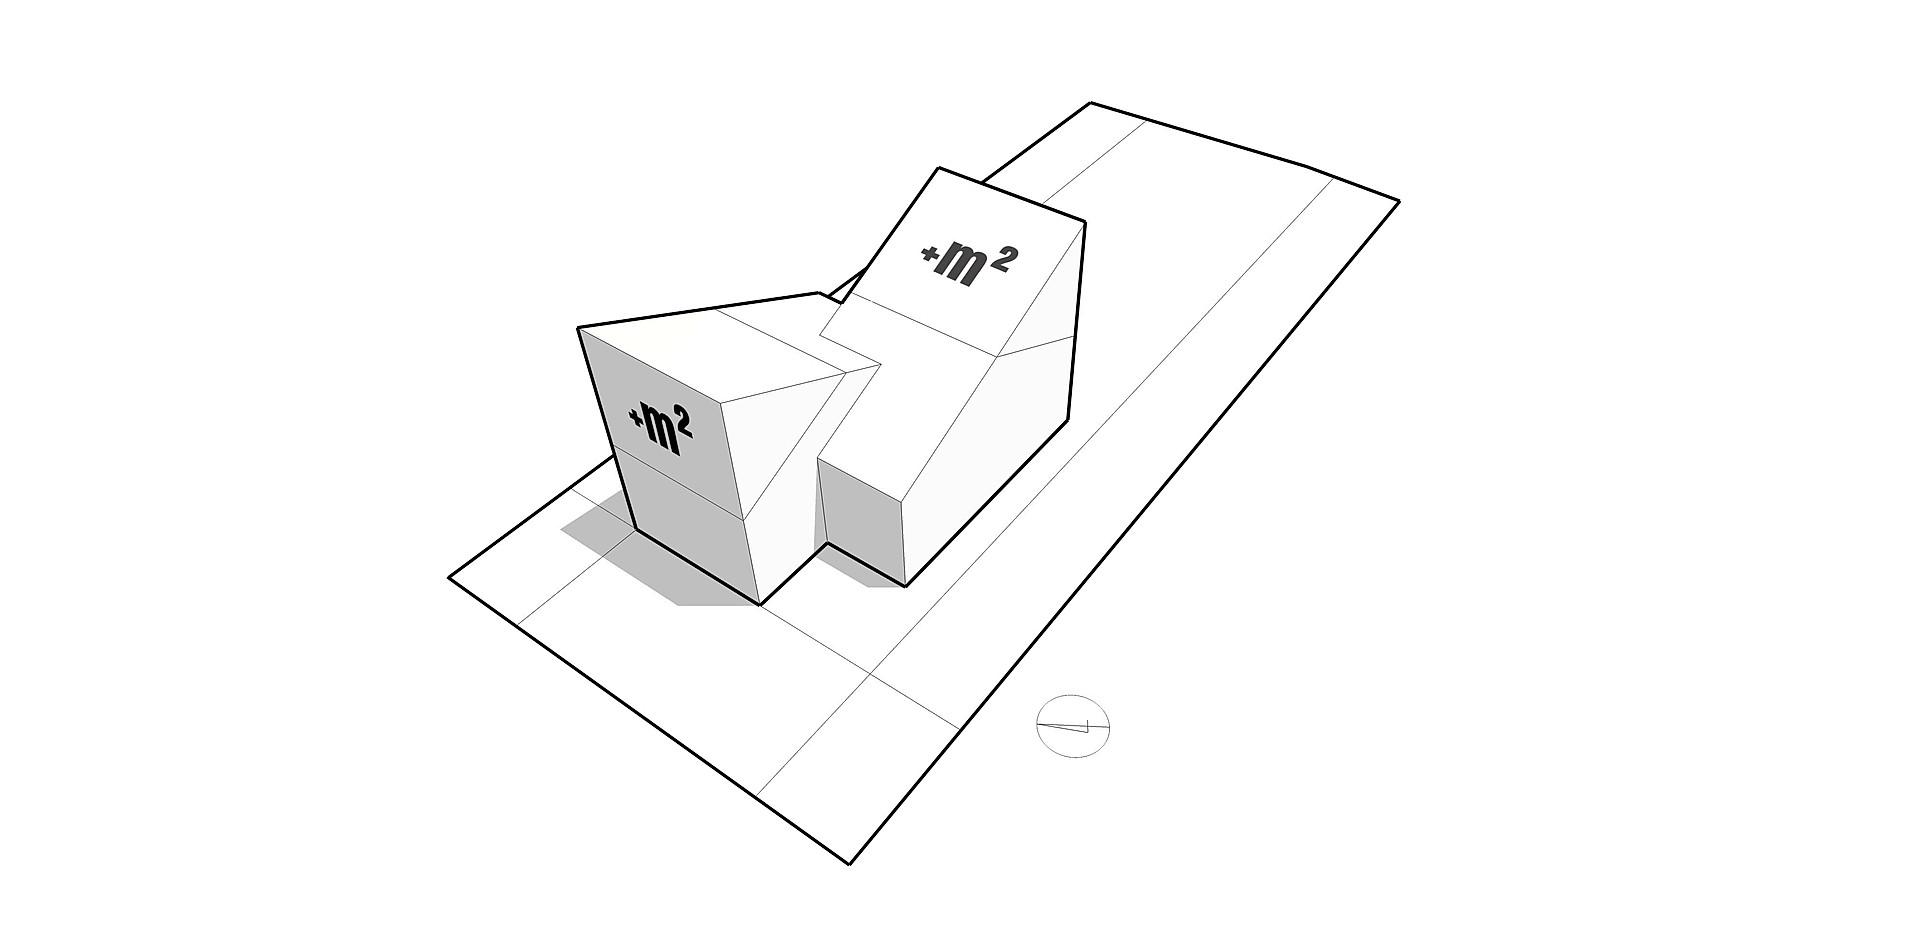 1302 idea 03.jpg